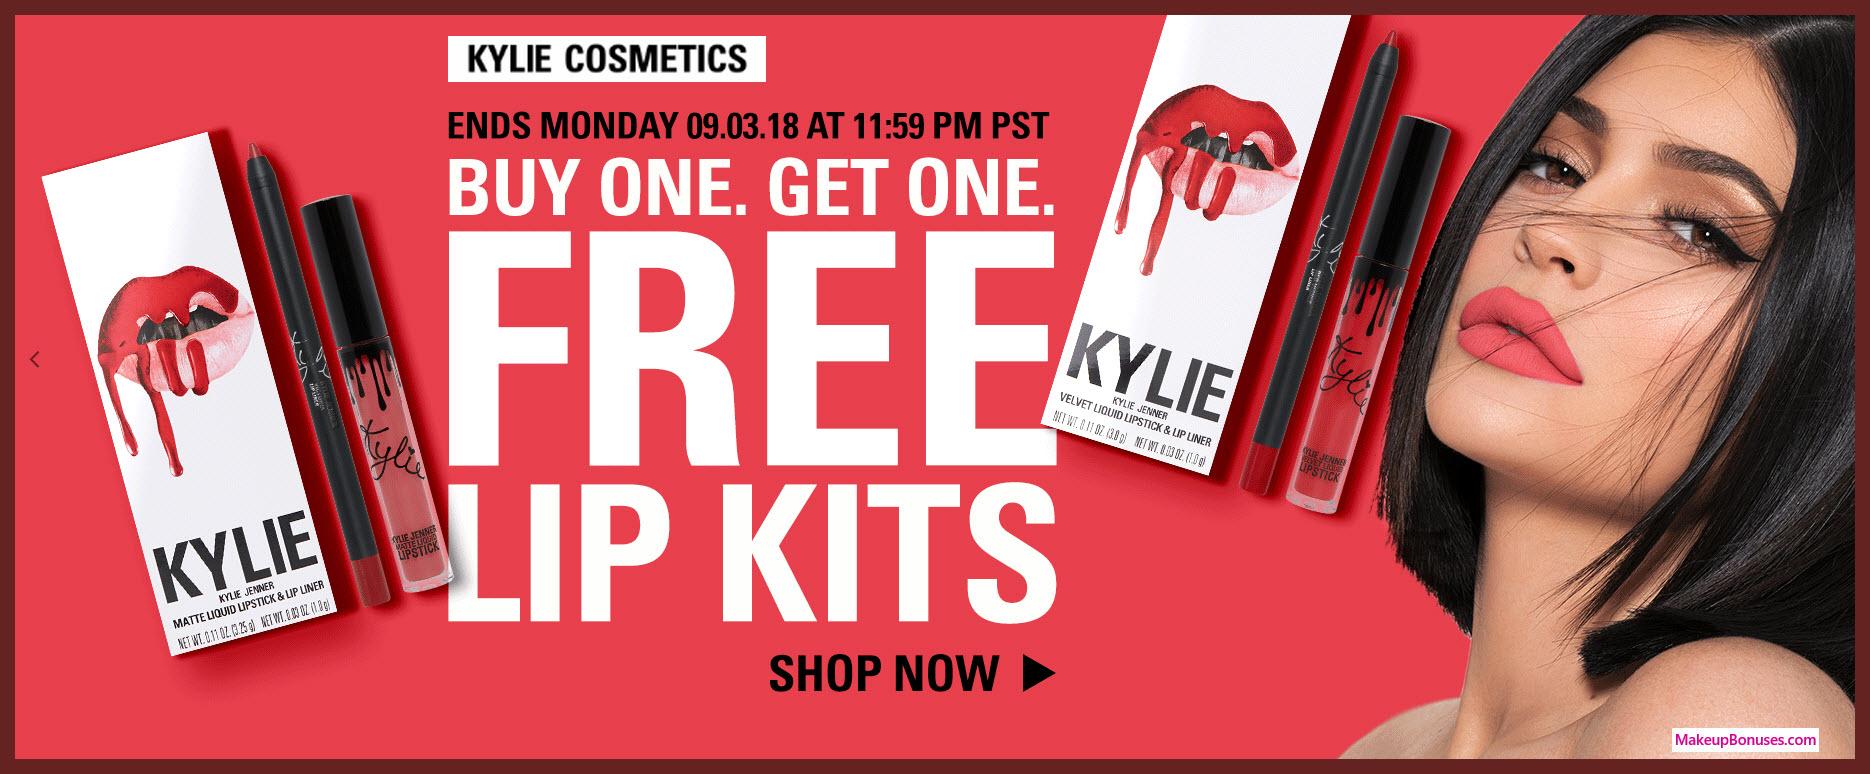 Kylie Cosmetics Sale - MakeupBonuses.com